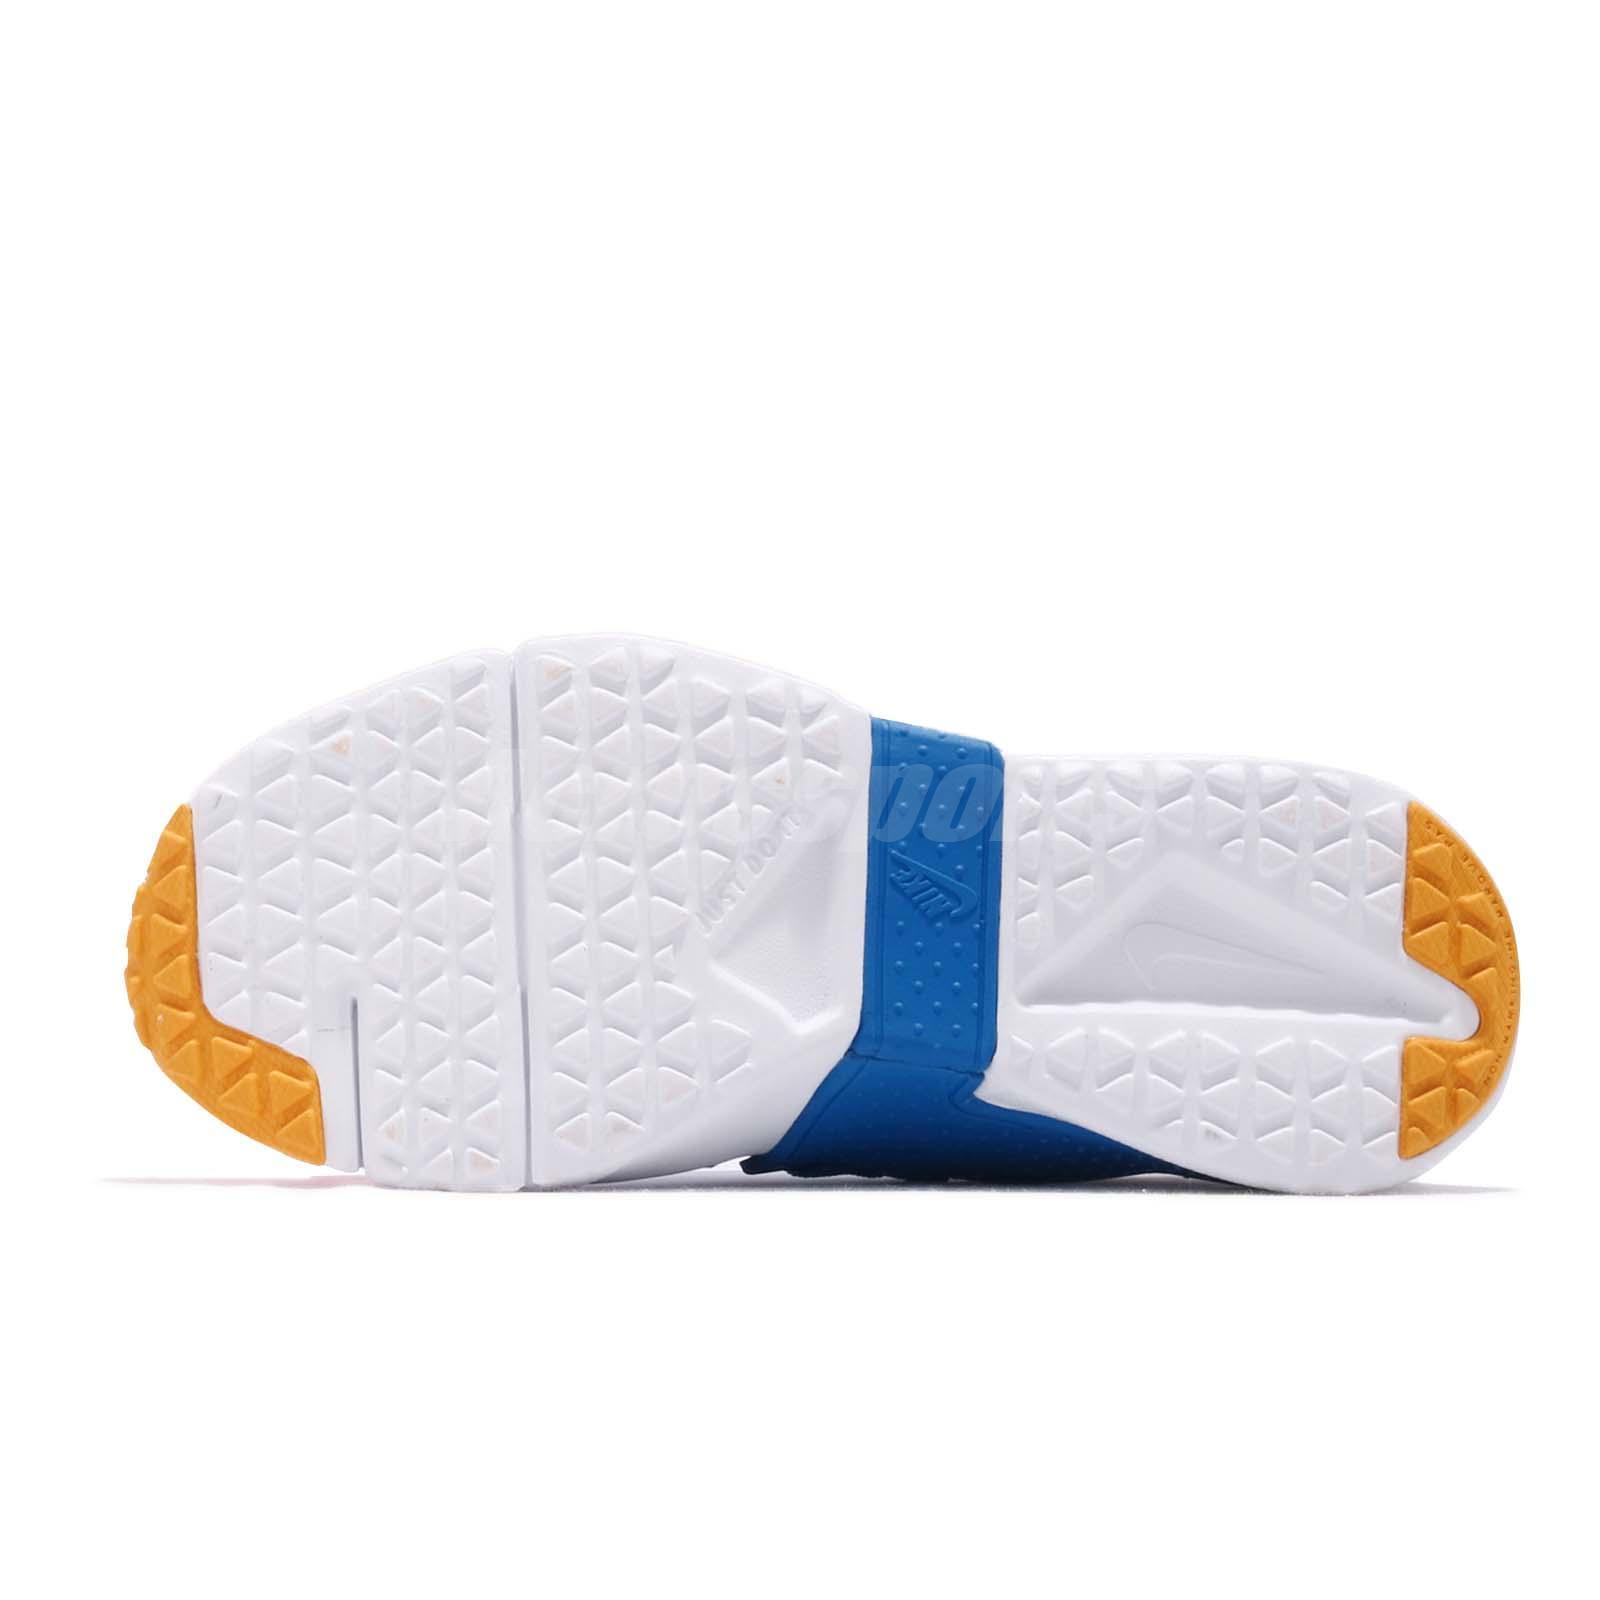 the latest d20ba 73a71 Nike Huarache Extreme Now PS Navy Amarillo Blue Kid Preschool Shoes ...